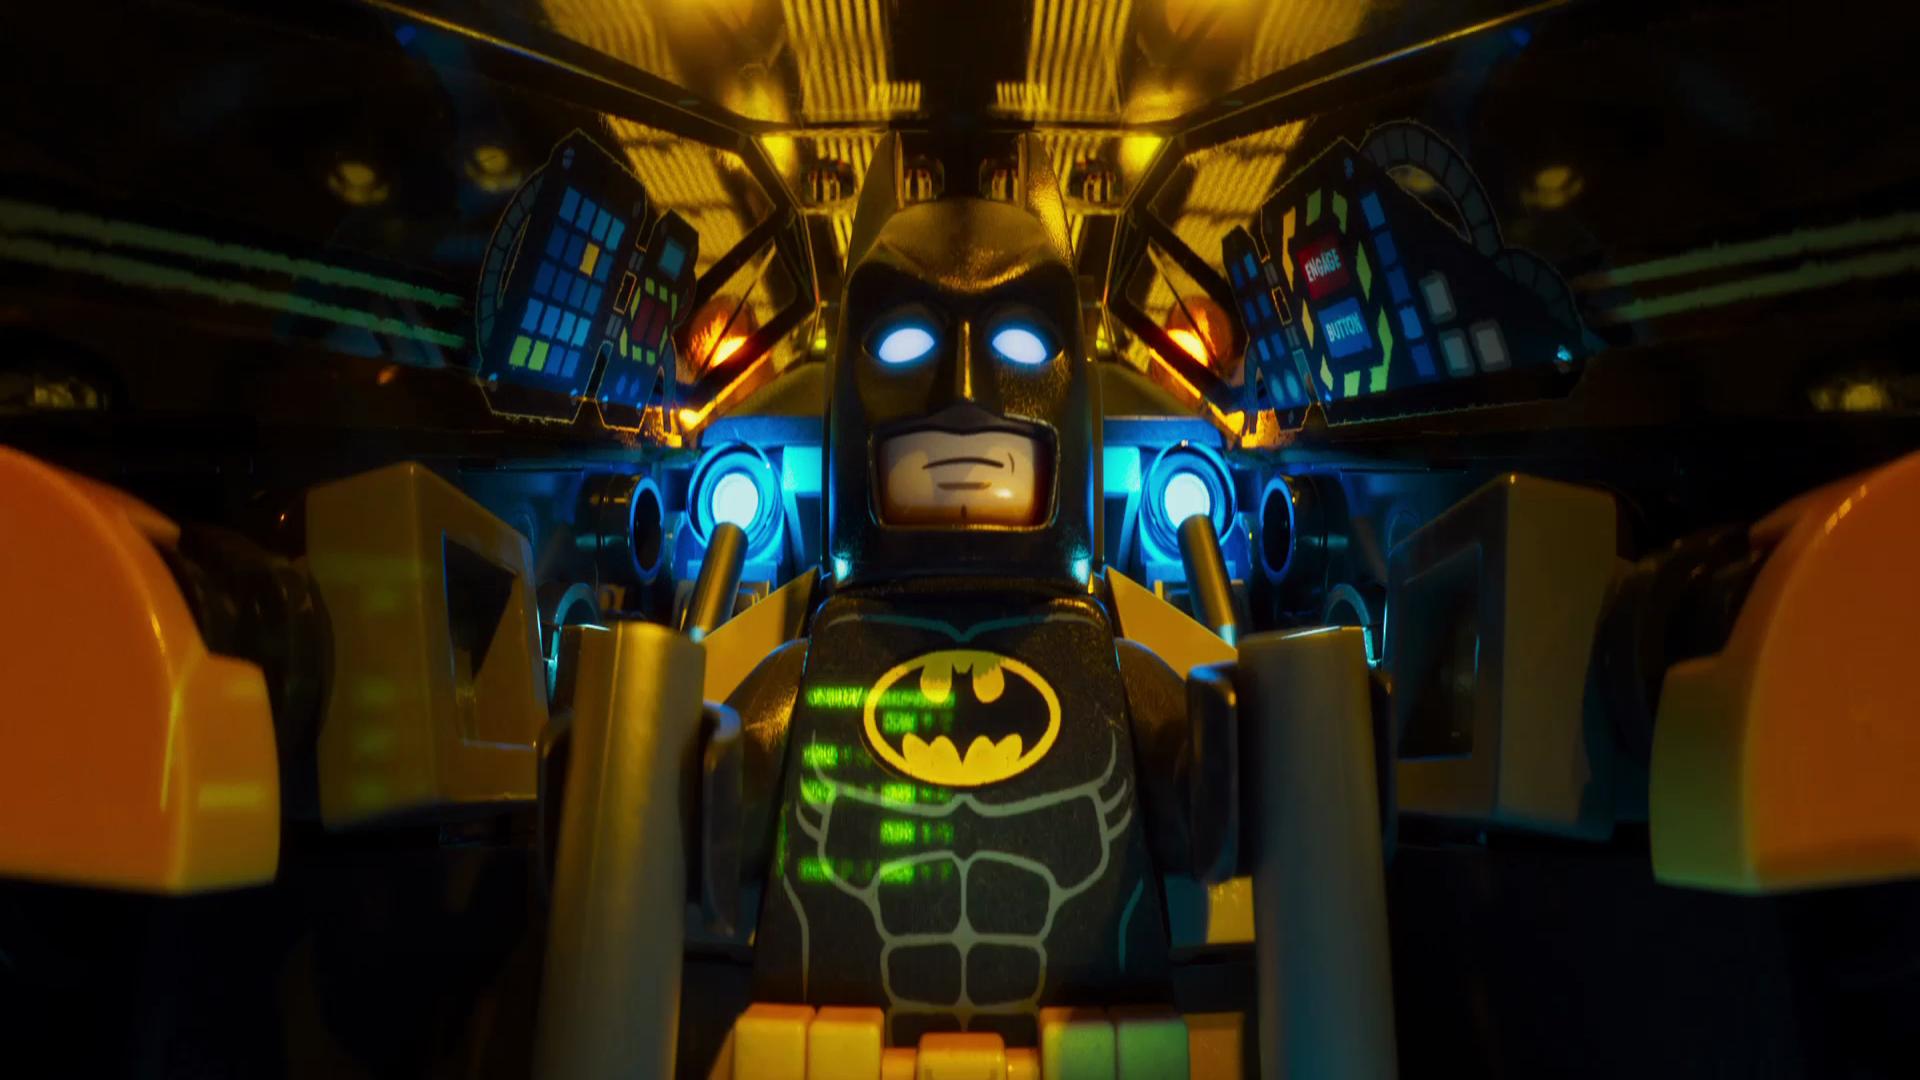 The Lego Batman Movie Wallpaper: The Lego Batman Movie 2017 HD Wallpaper